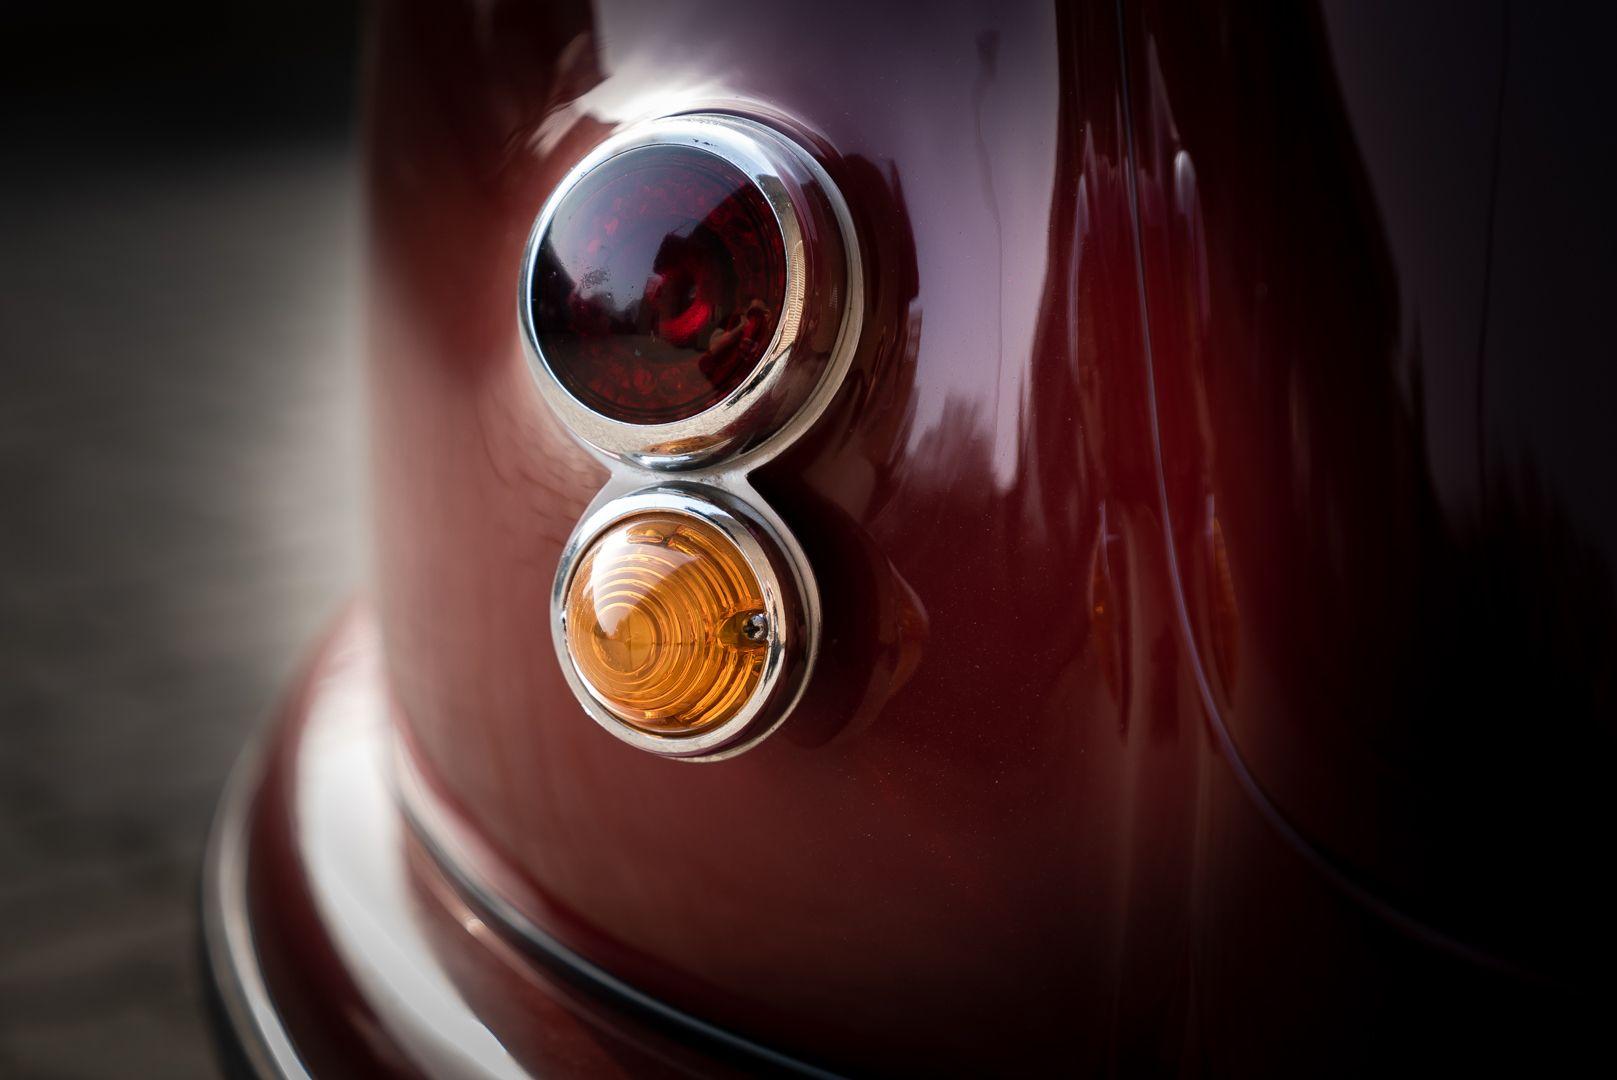 1947 Alfa Romeo Freccia d'oro 6C 2500 Sport 61708